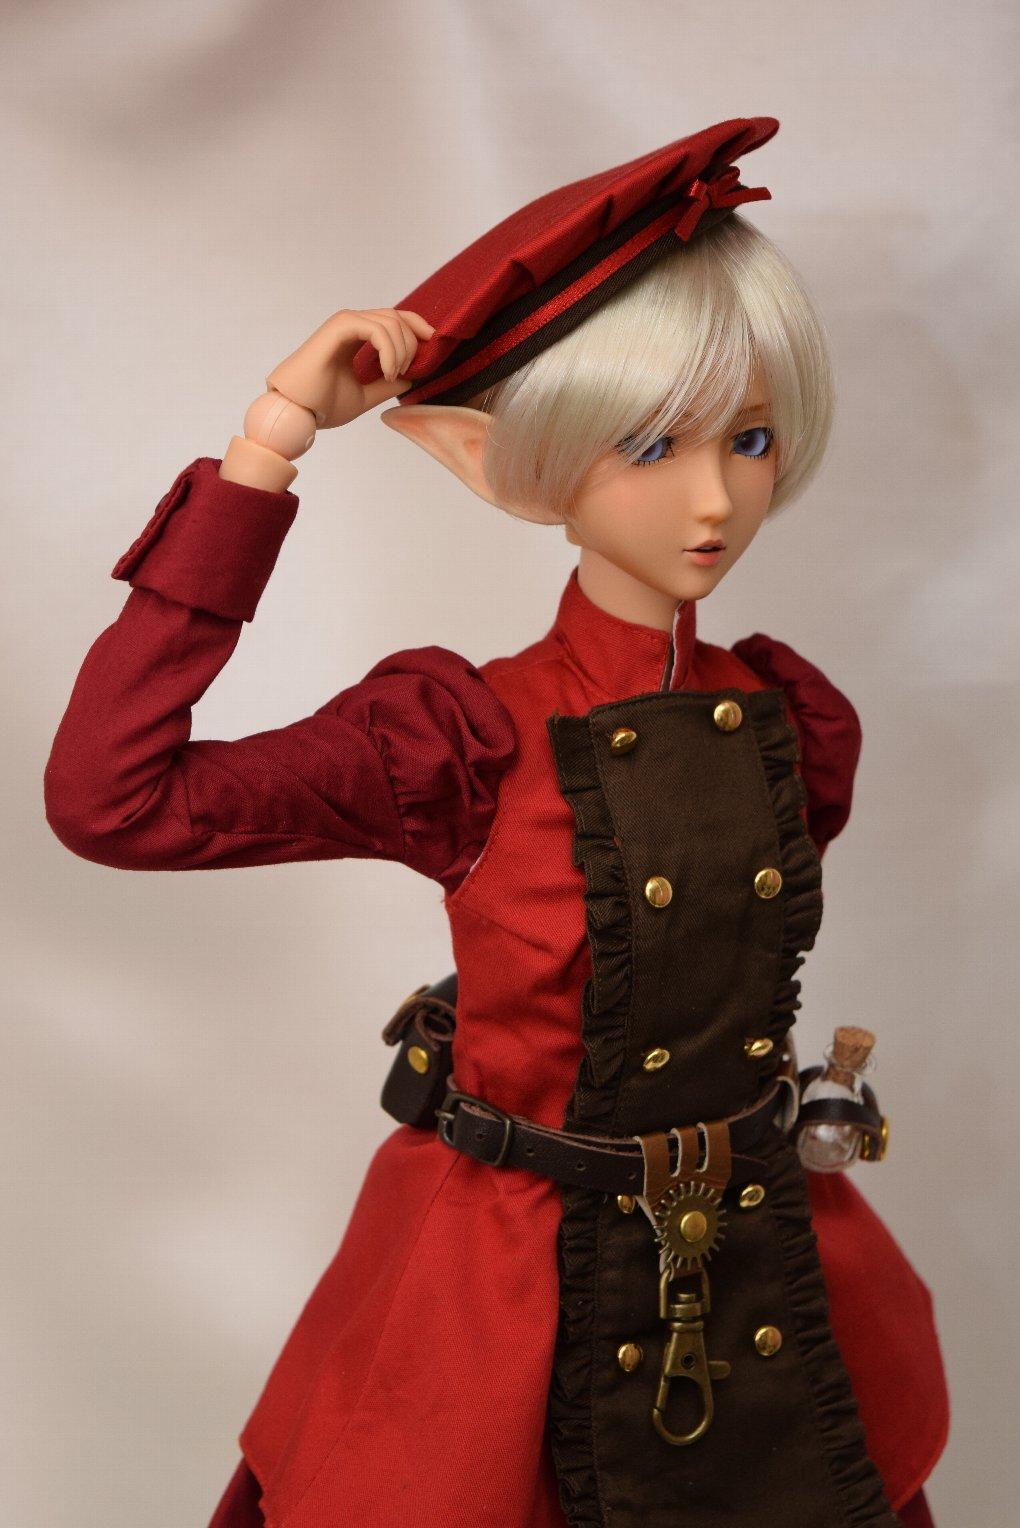 doll_4433.jpg